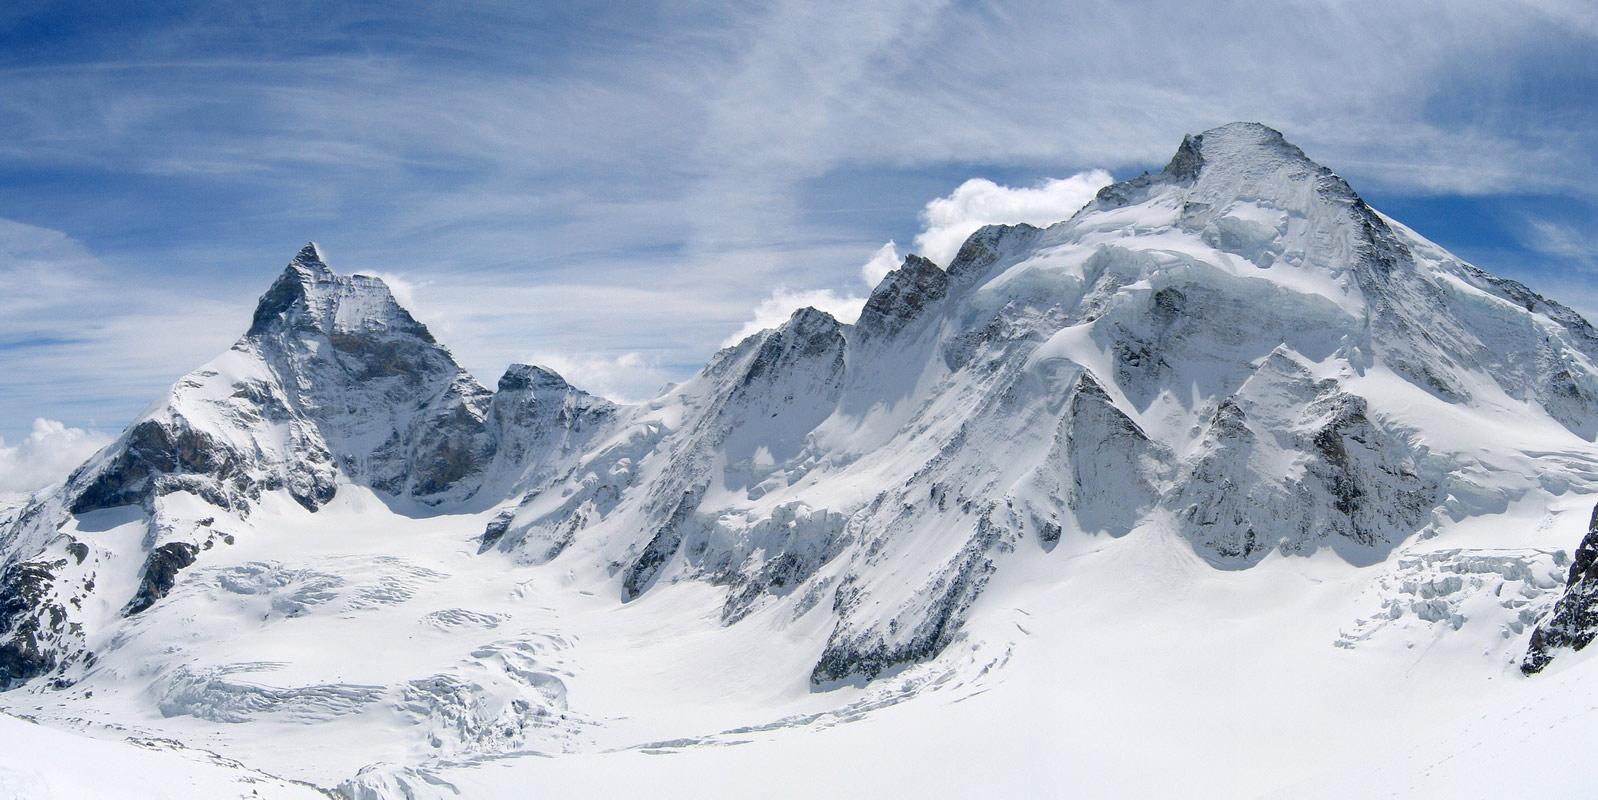 Col Valpelline, Day 6 H.R. Chamonix-Zermatt Walliser Alpen / Alpes valaisannes Švýcarsko panorama 56